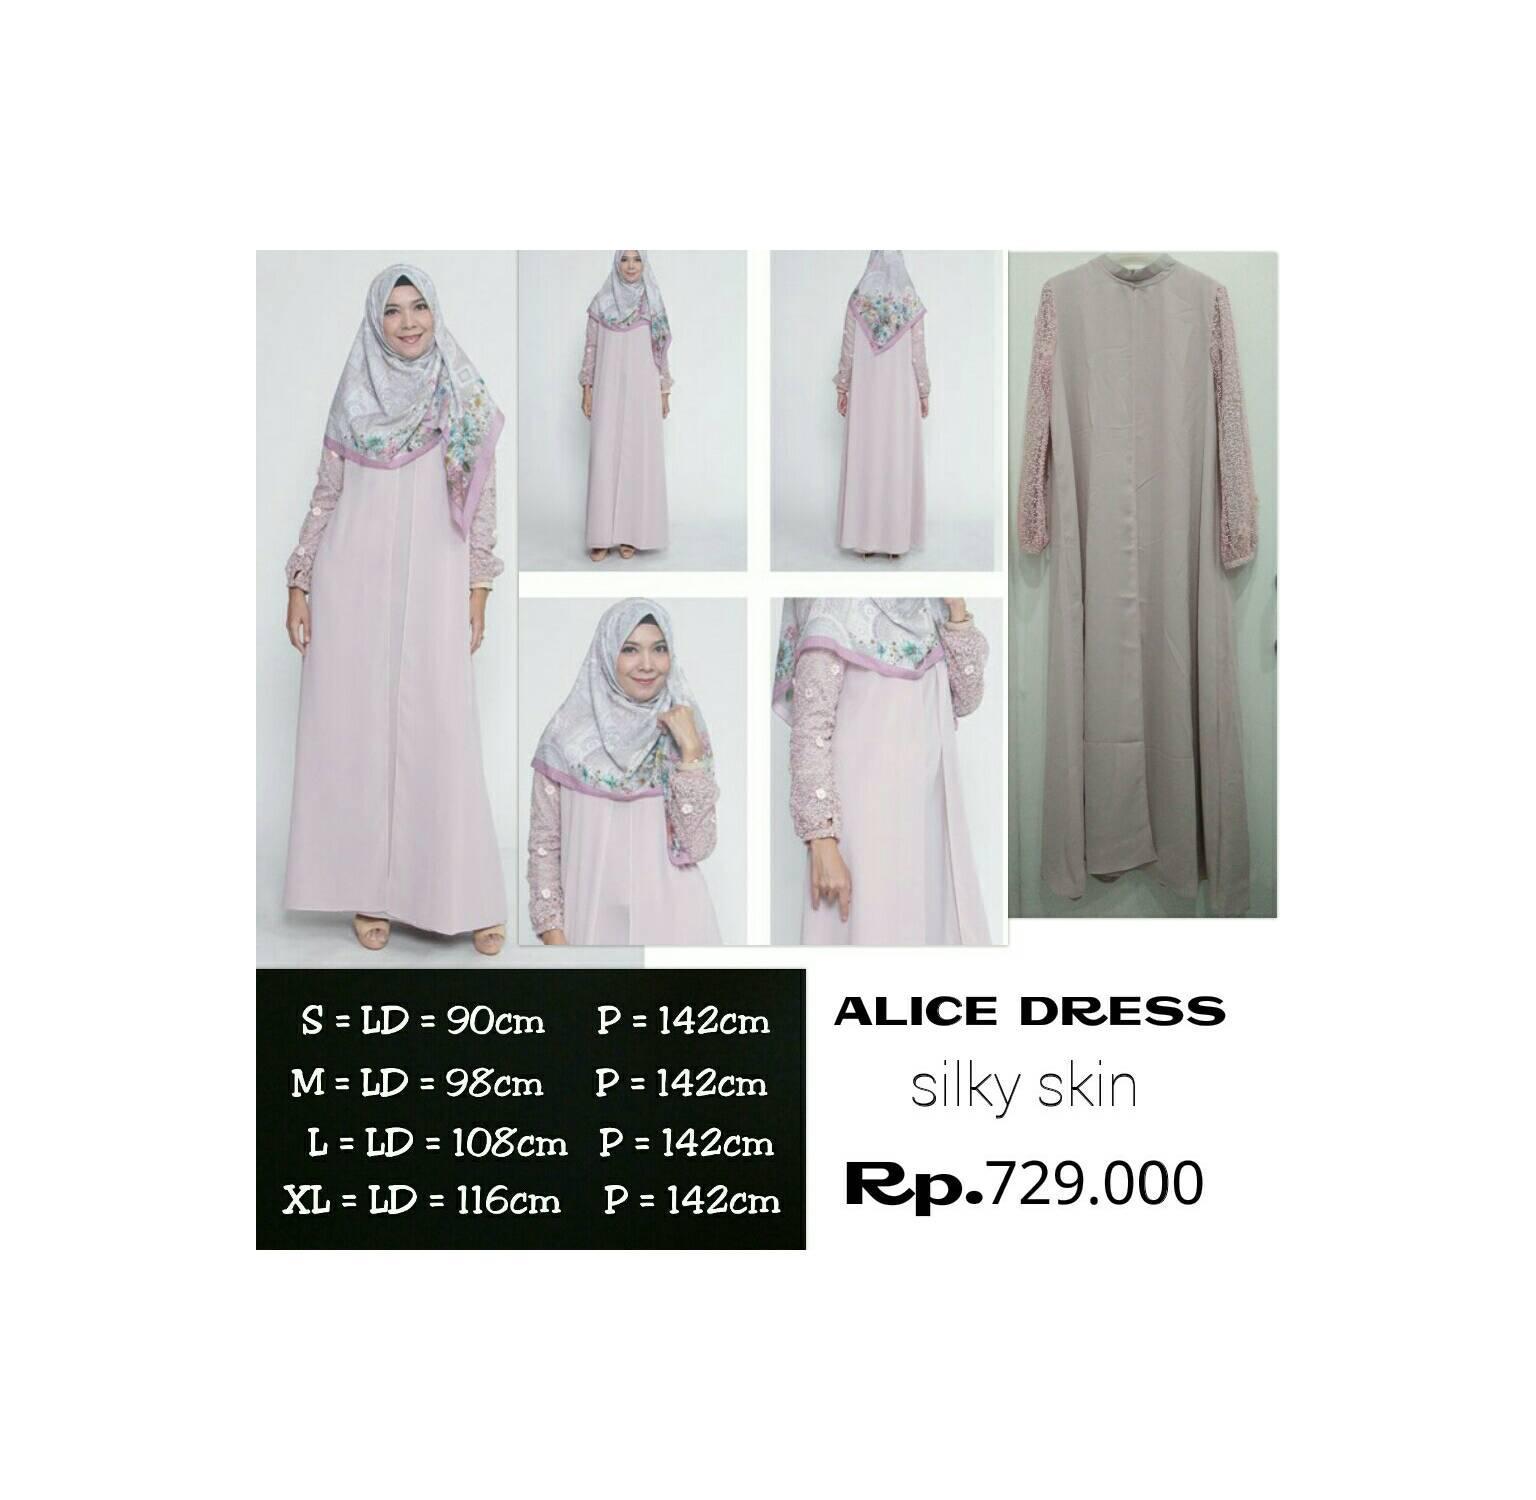 Dress Alice Zoya Rp 729.000 Discount Jadi Rp 656.100